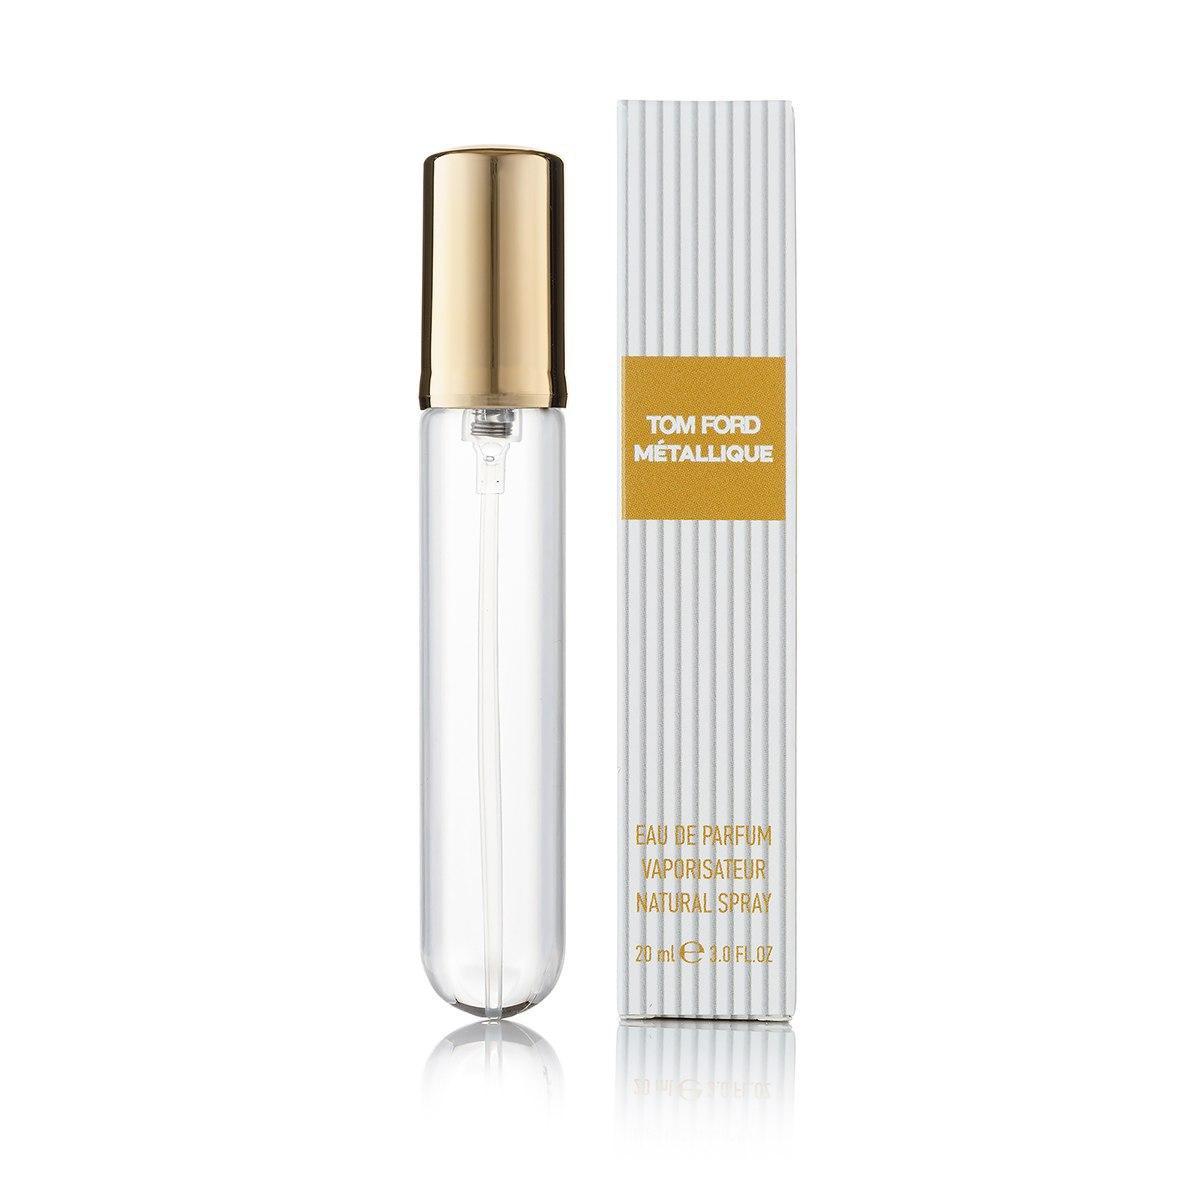 20 мл парфум спрей Tom Ford Metallique (Ж)